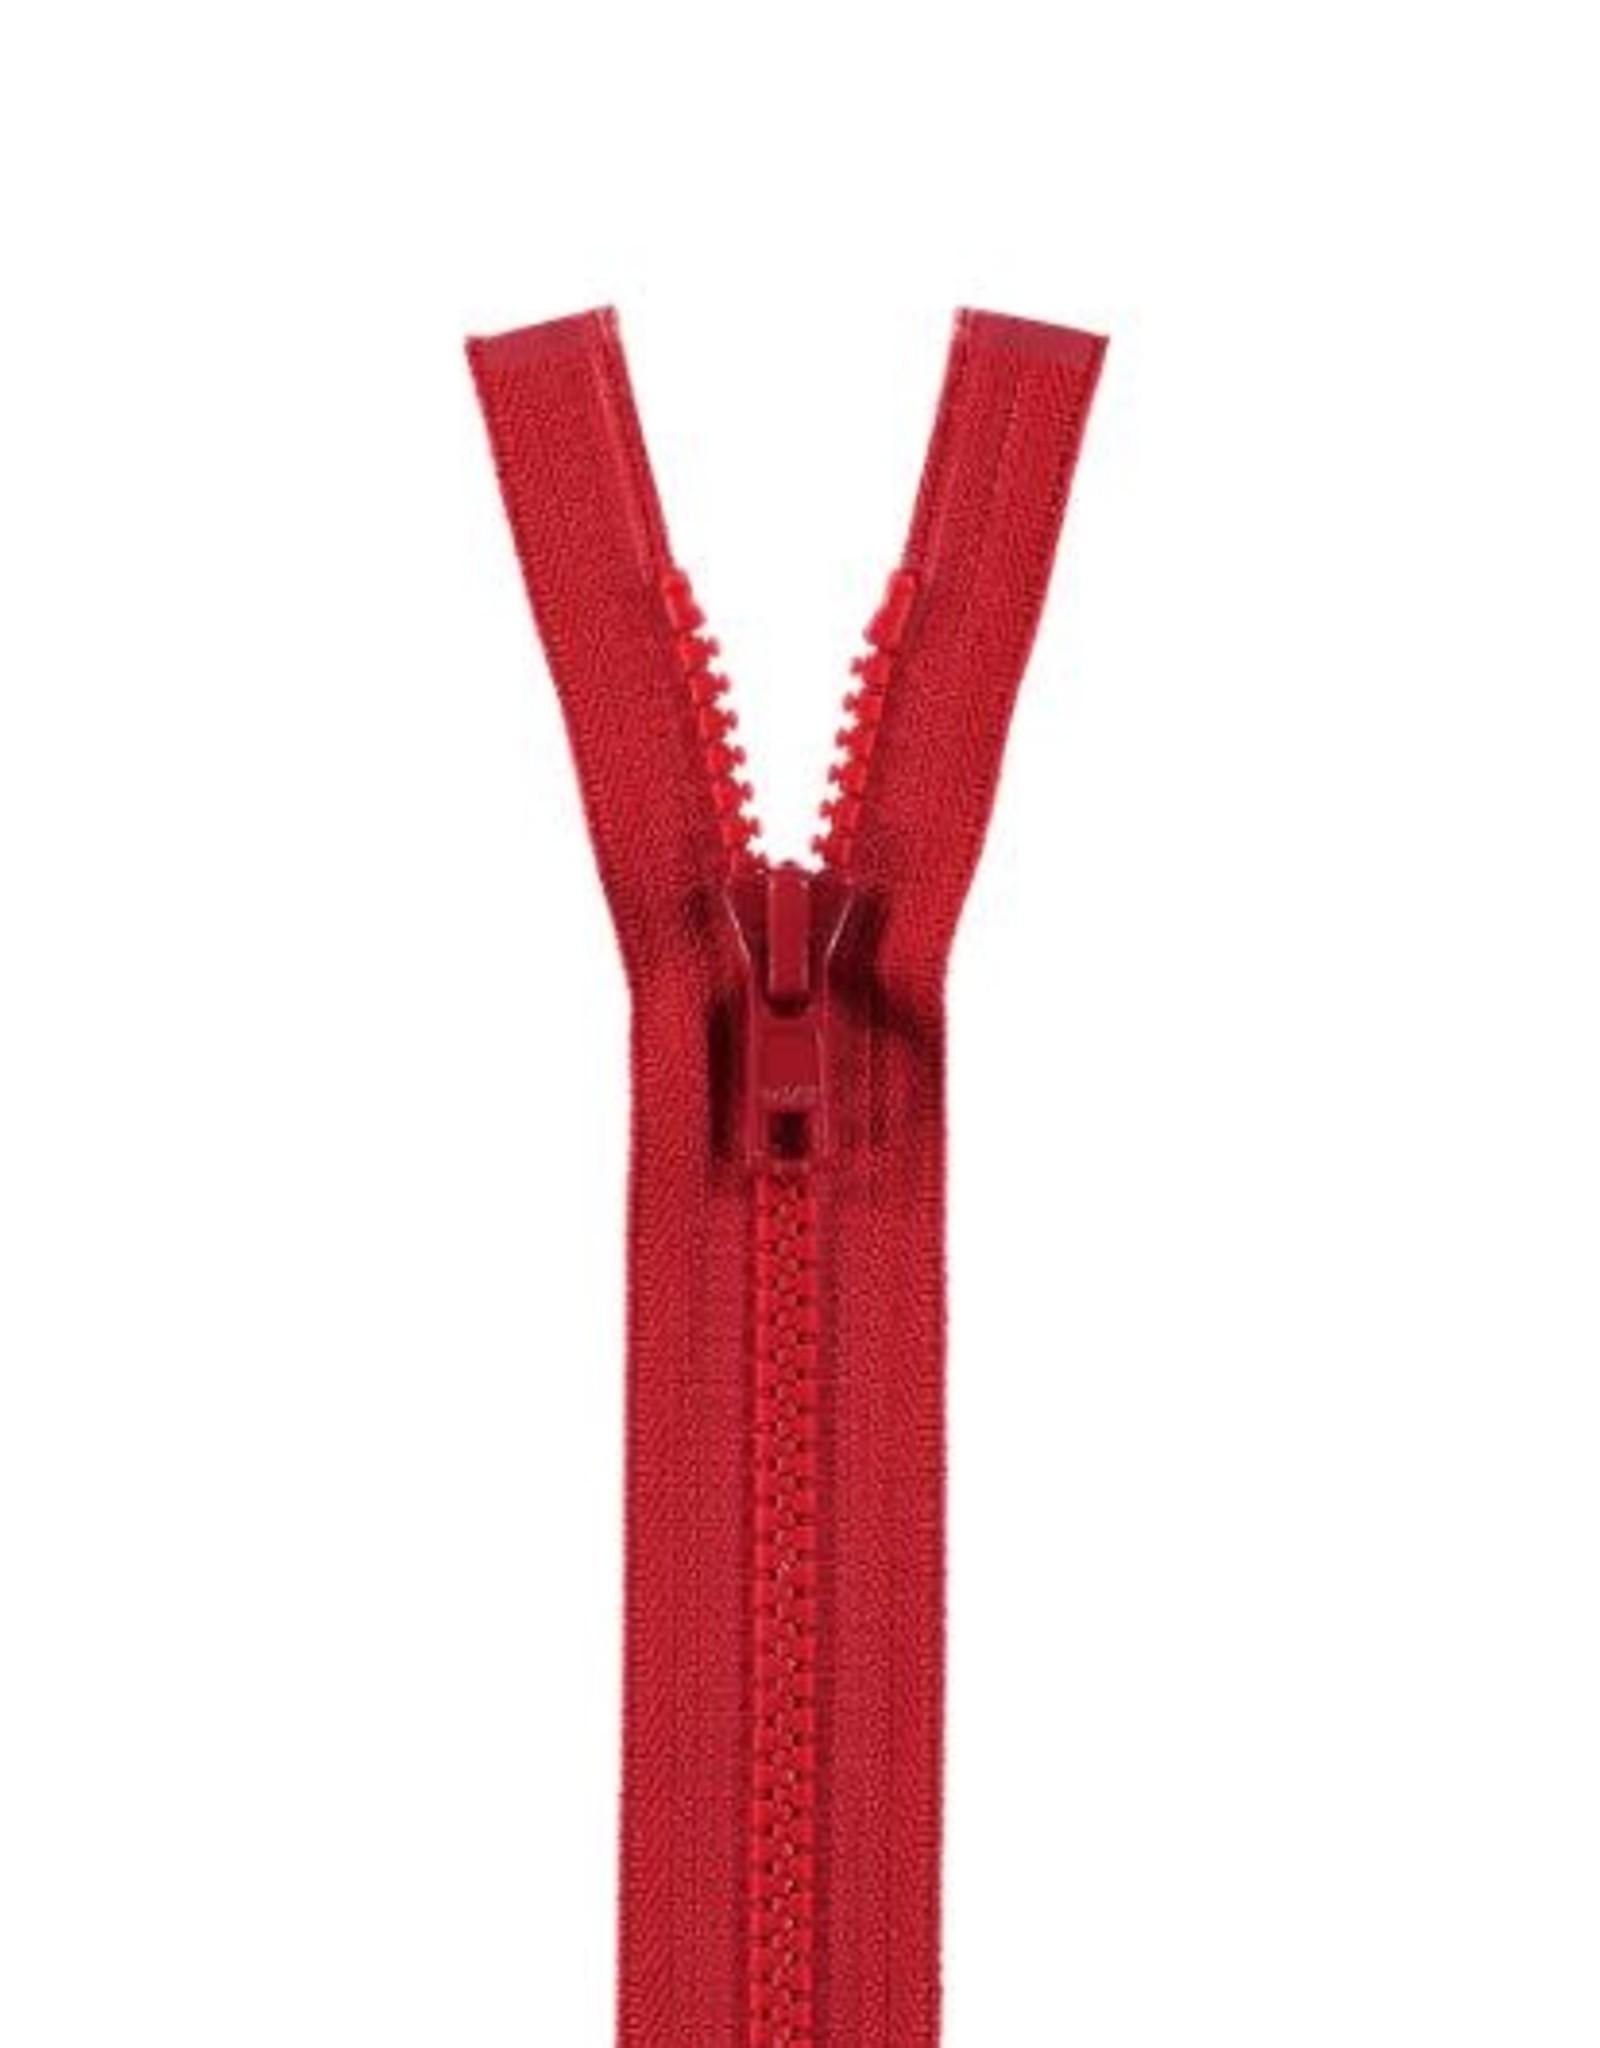 YKK BLOKRITS 5 DEELBAAR rood 519-70cm